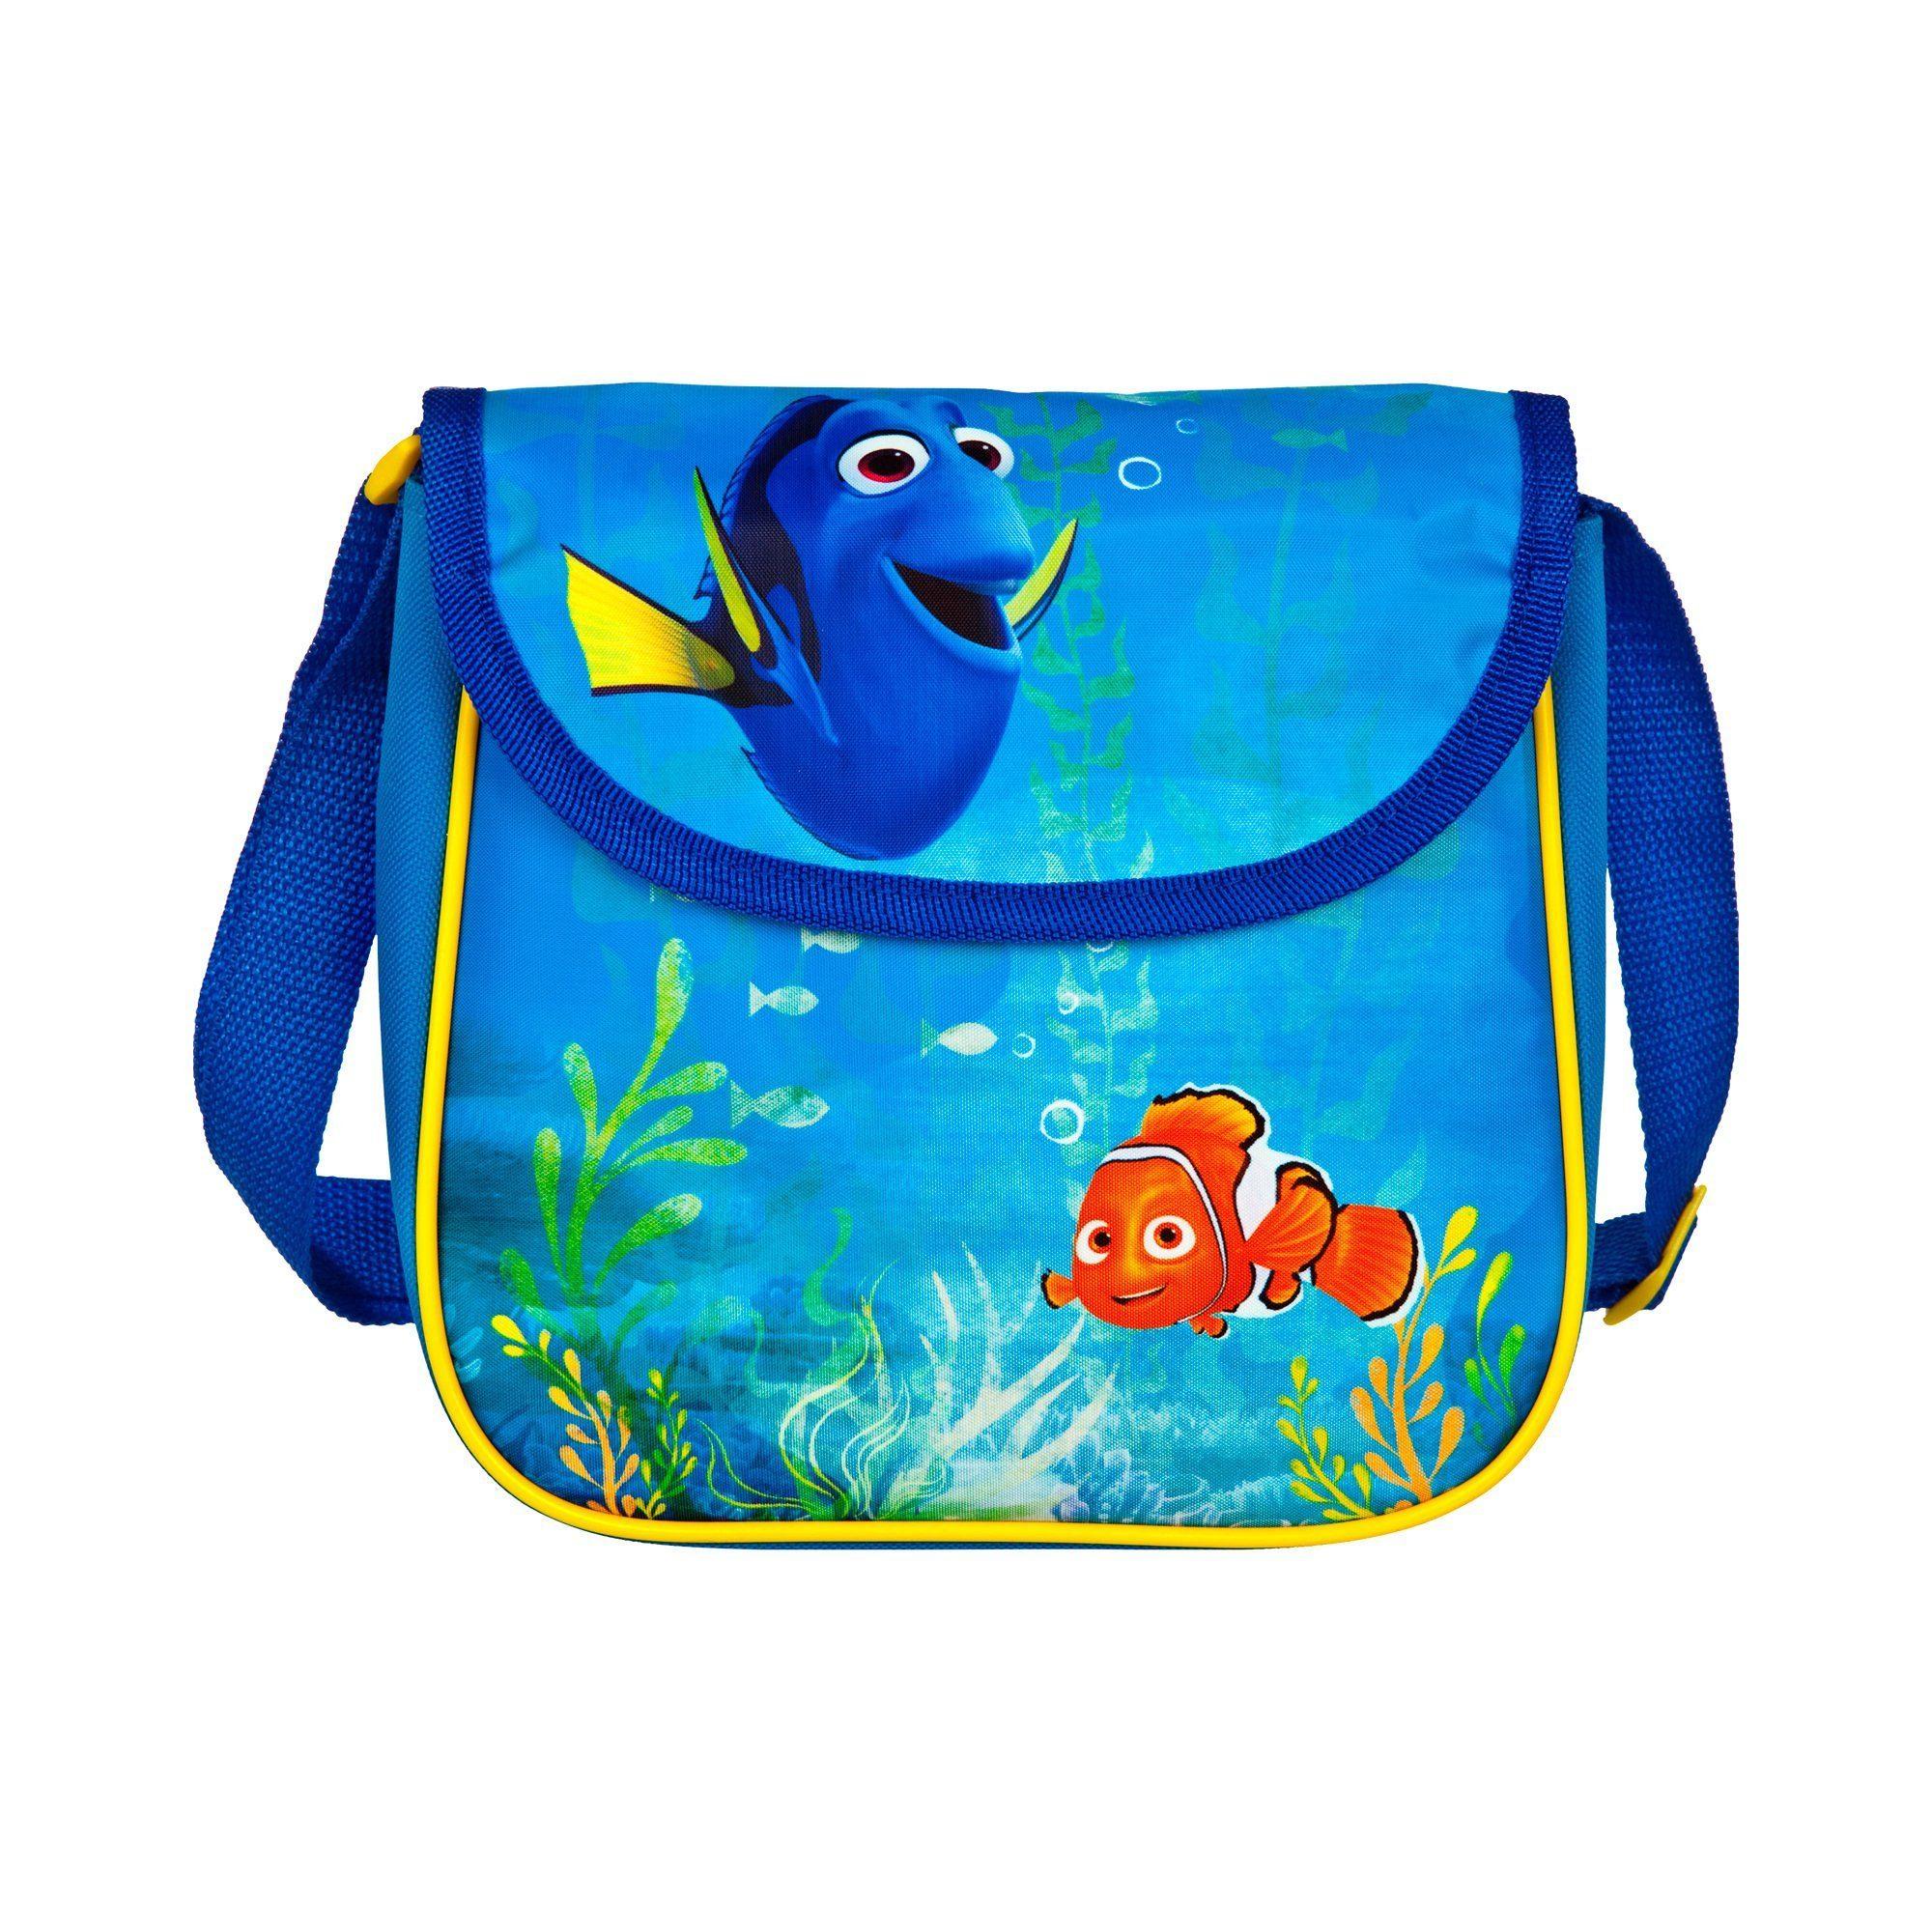 UNDERCOVER Kindergartentasche